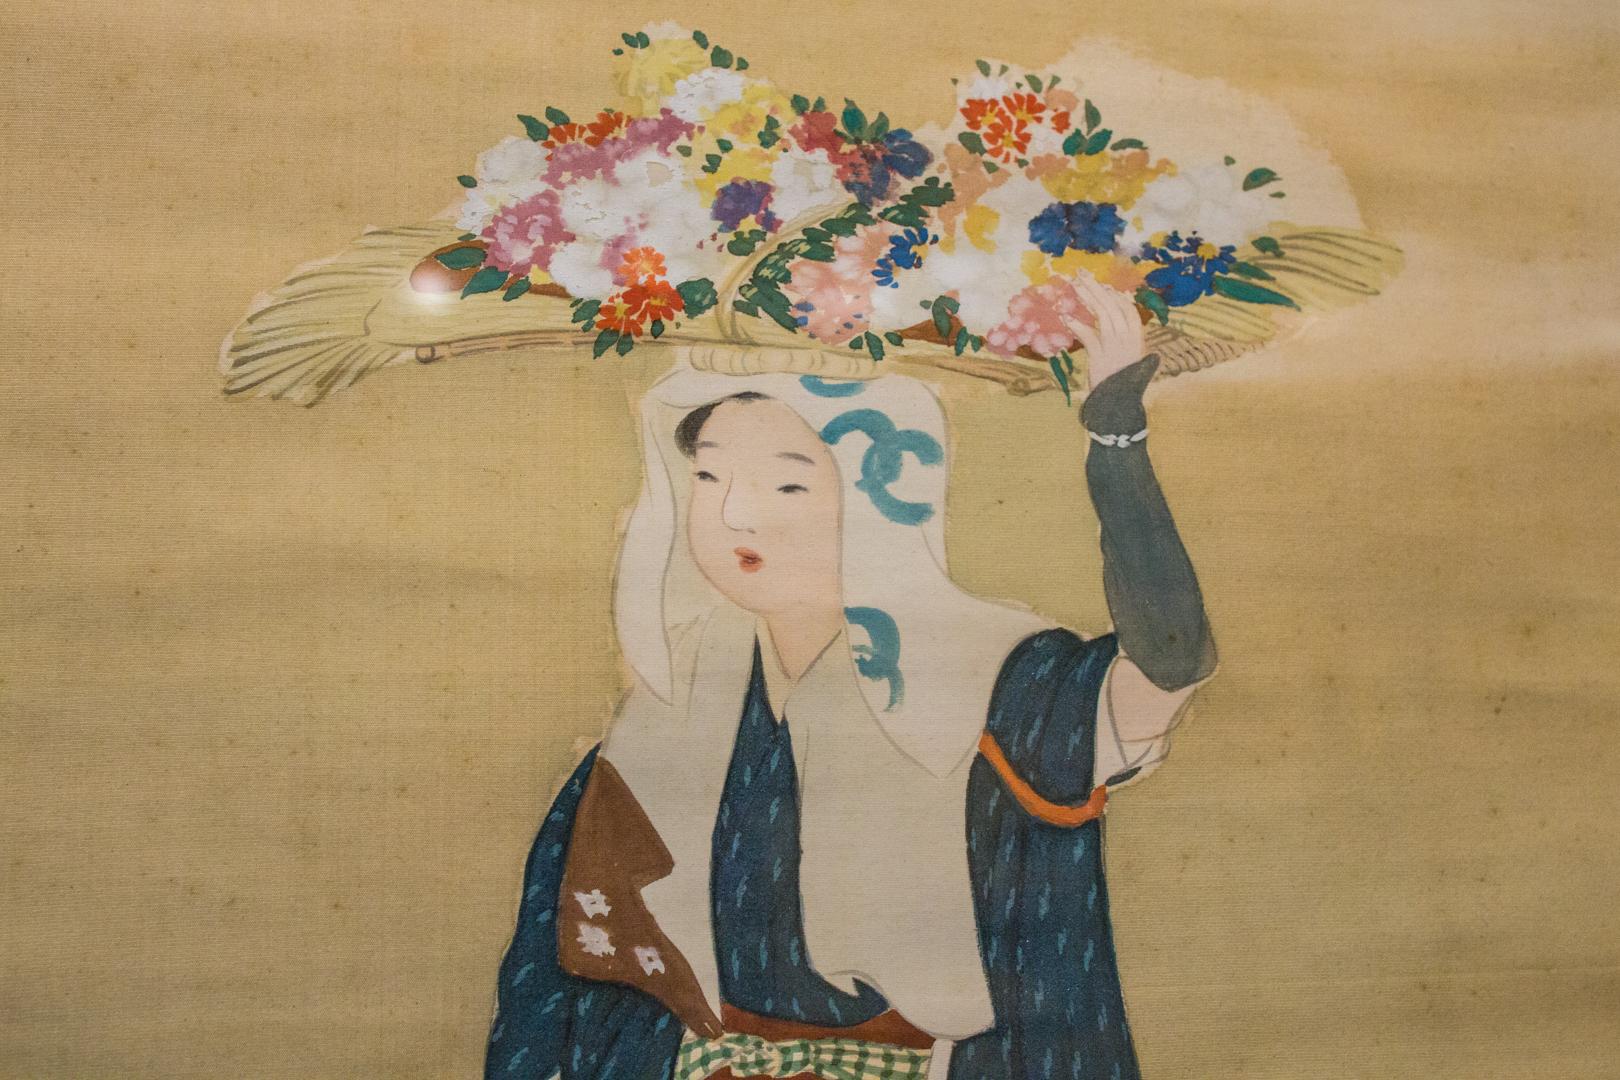 Object of the Week: Woman Selling Flowers